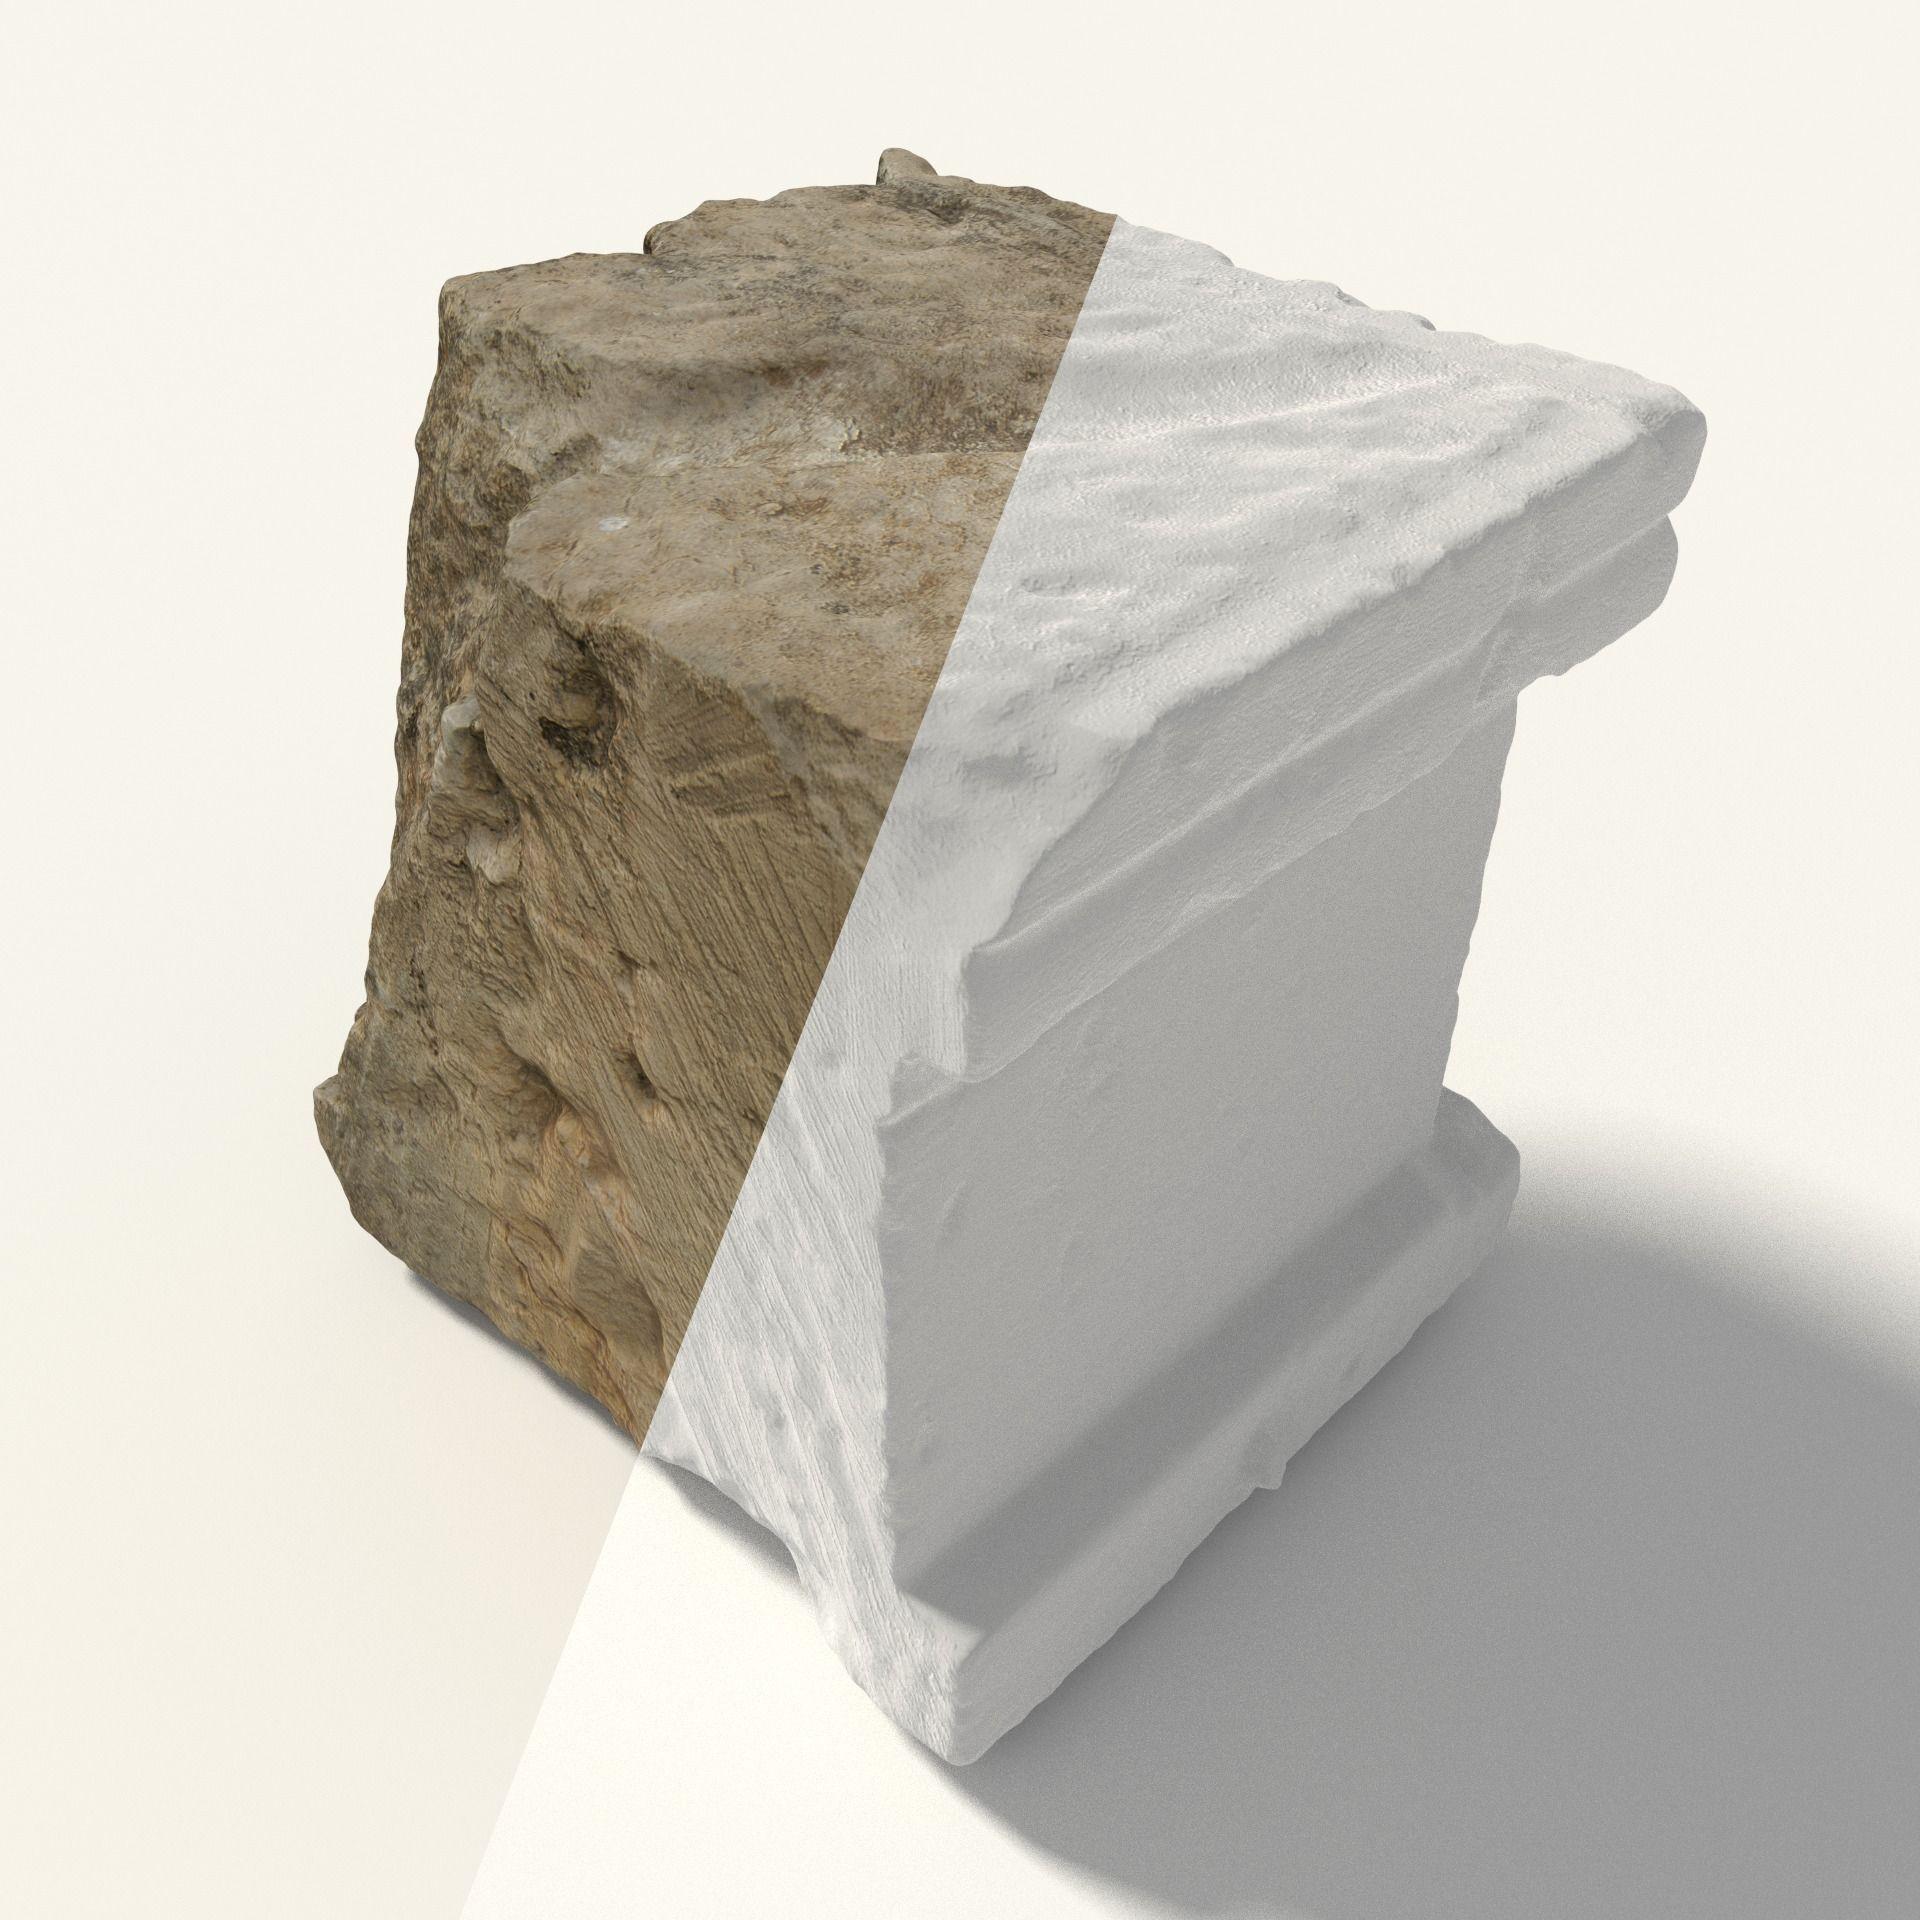 Scanned Cubic Stone 3D Model Game ready .obj .3ds .fbx ... on Granite Models  id=12052